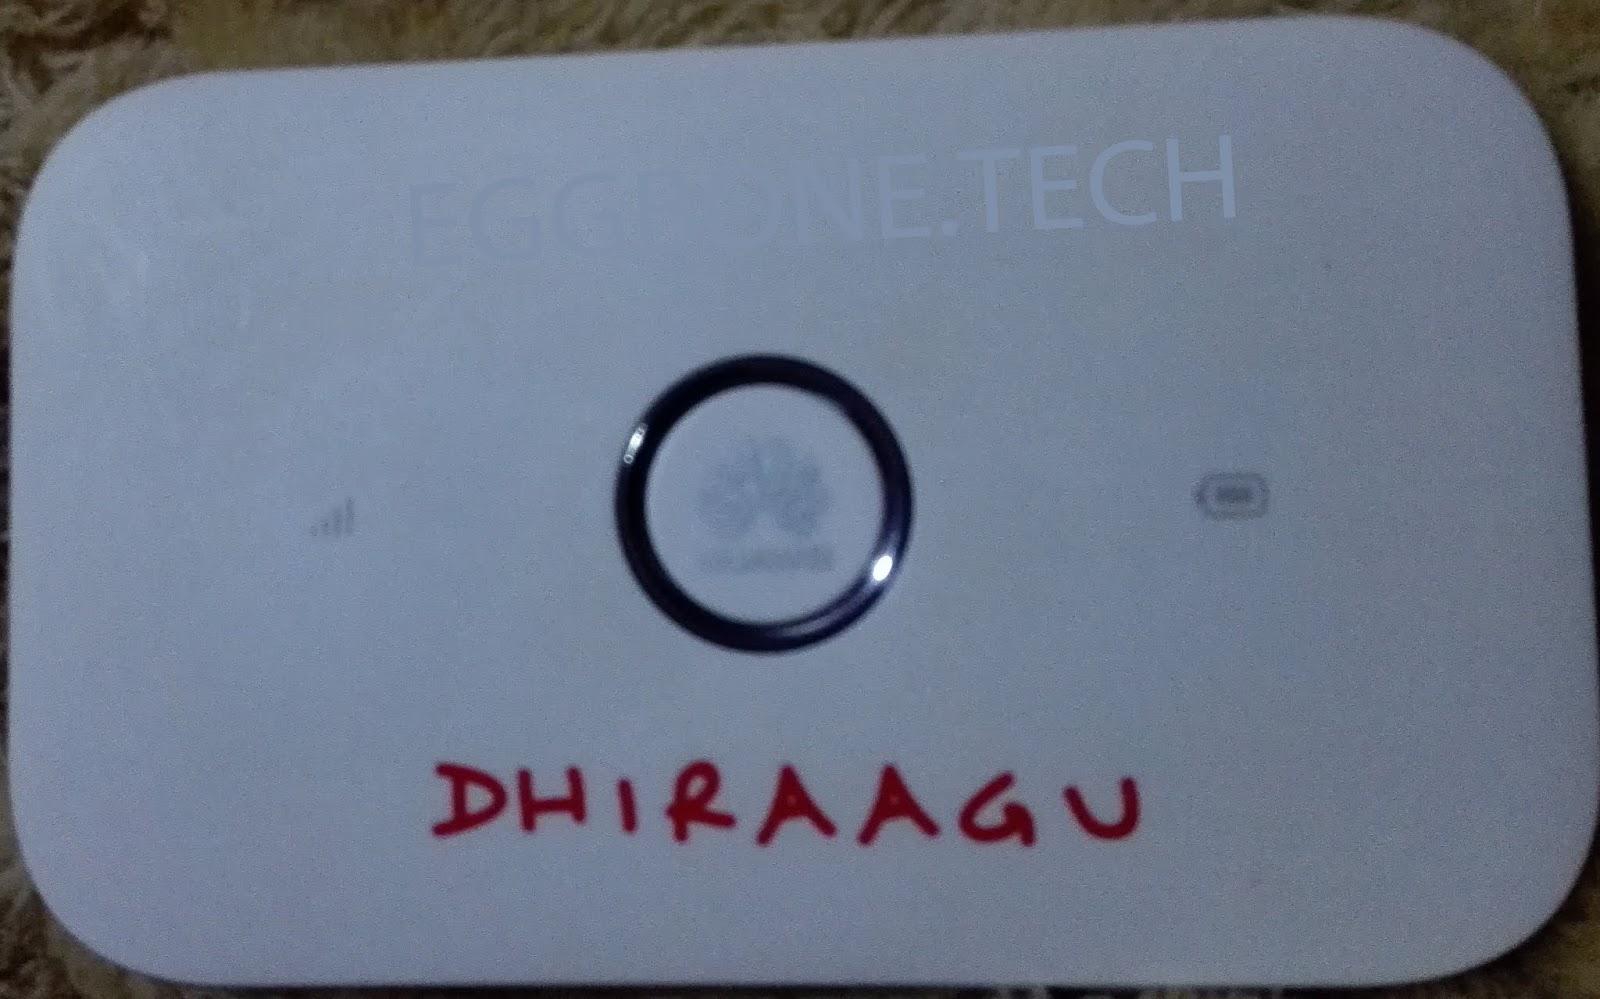 Unlock / Crack Dhiraagu Huawei E5573s-856 Mobile WiFi